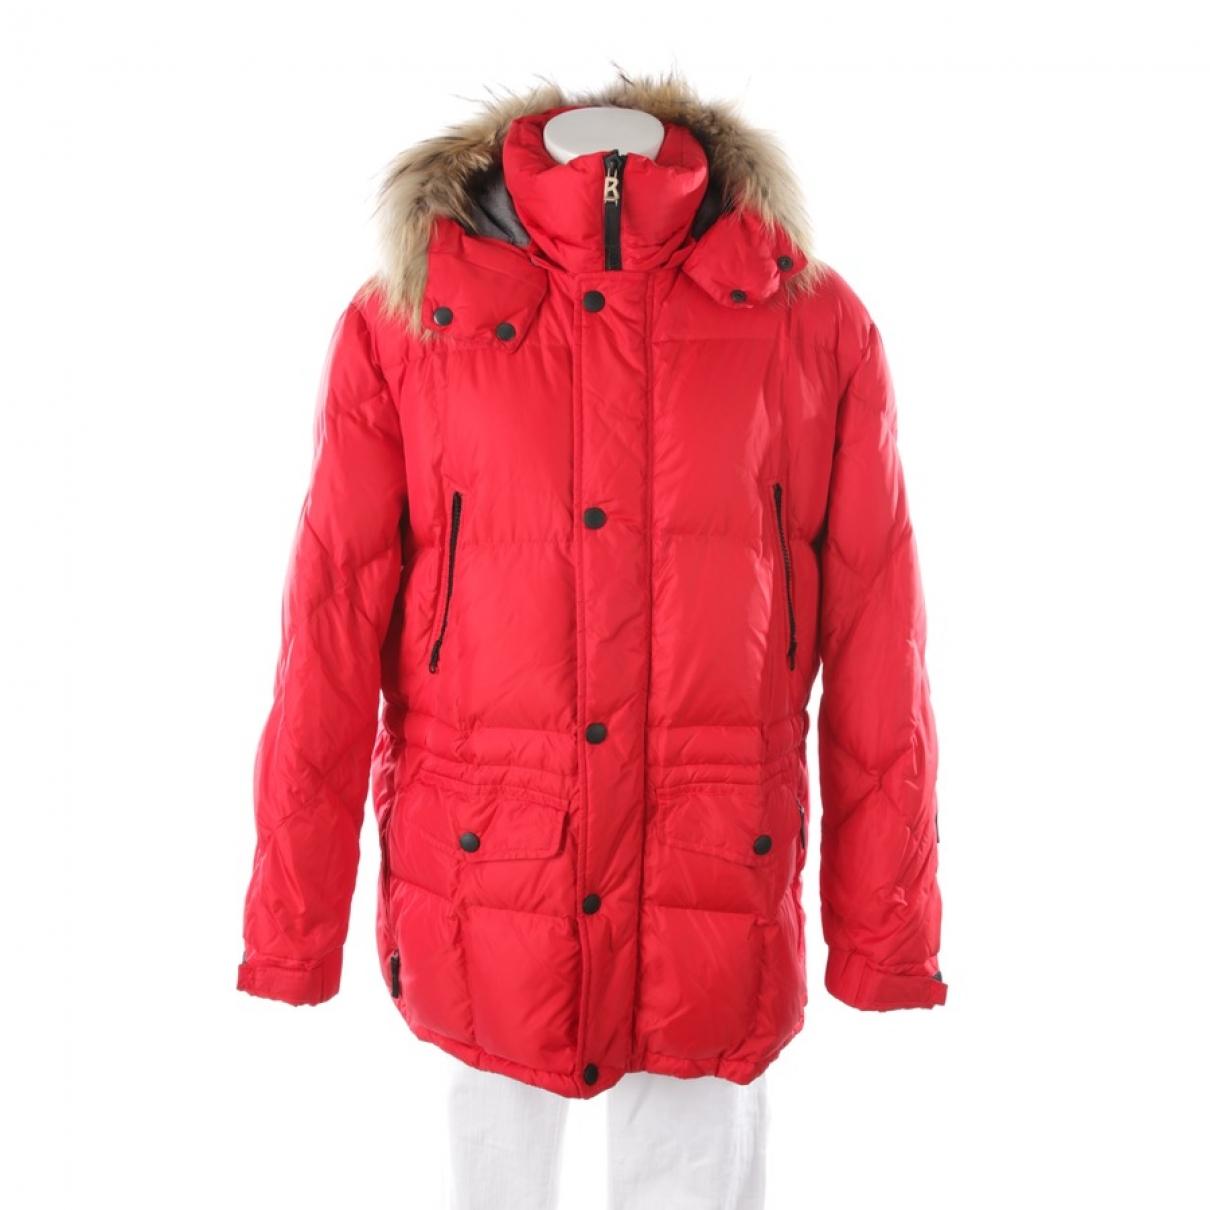 Bogner \N Red coat for Women XXXXL